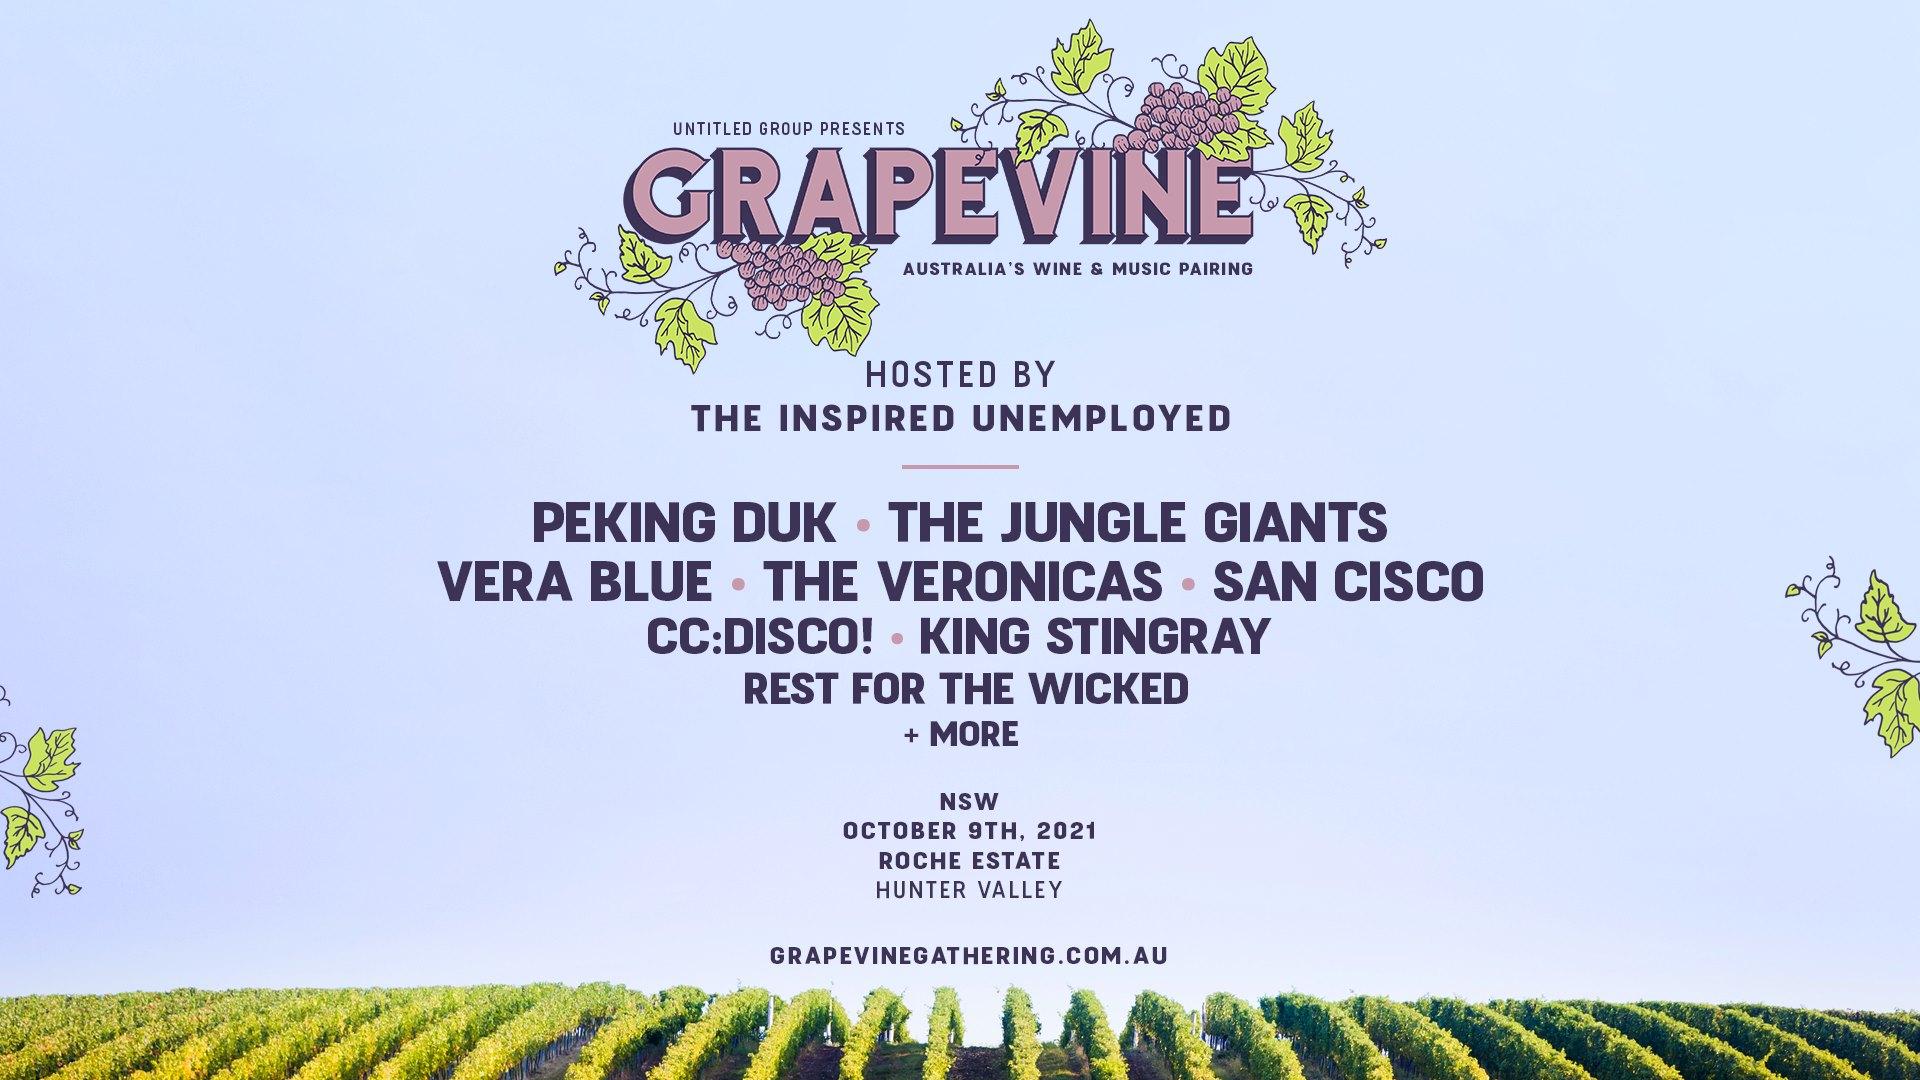 Grapevine Gathering 2021